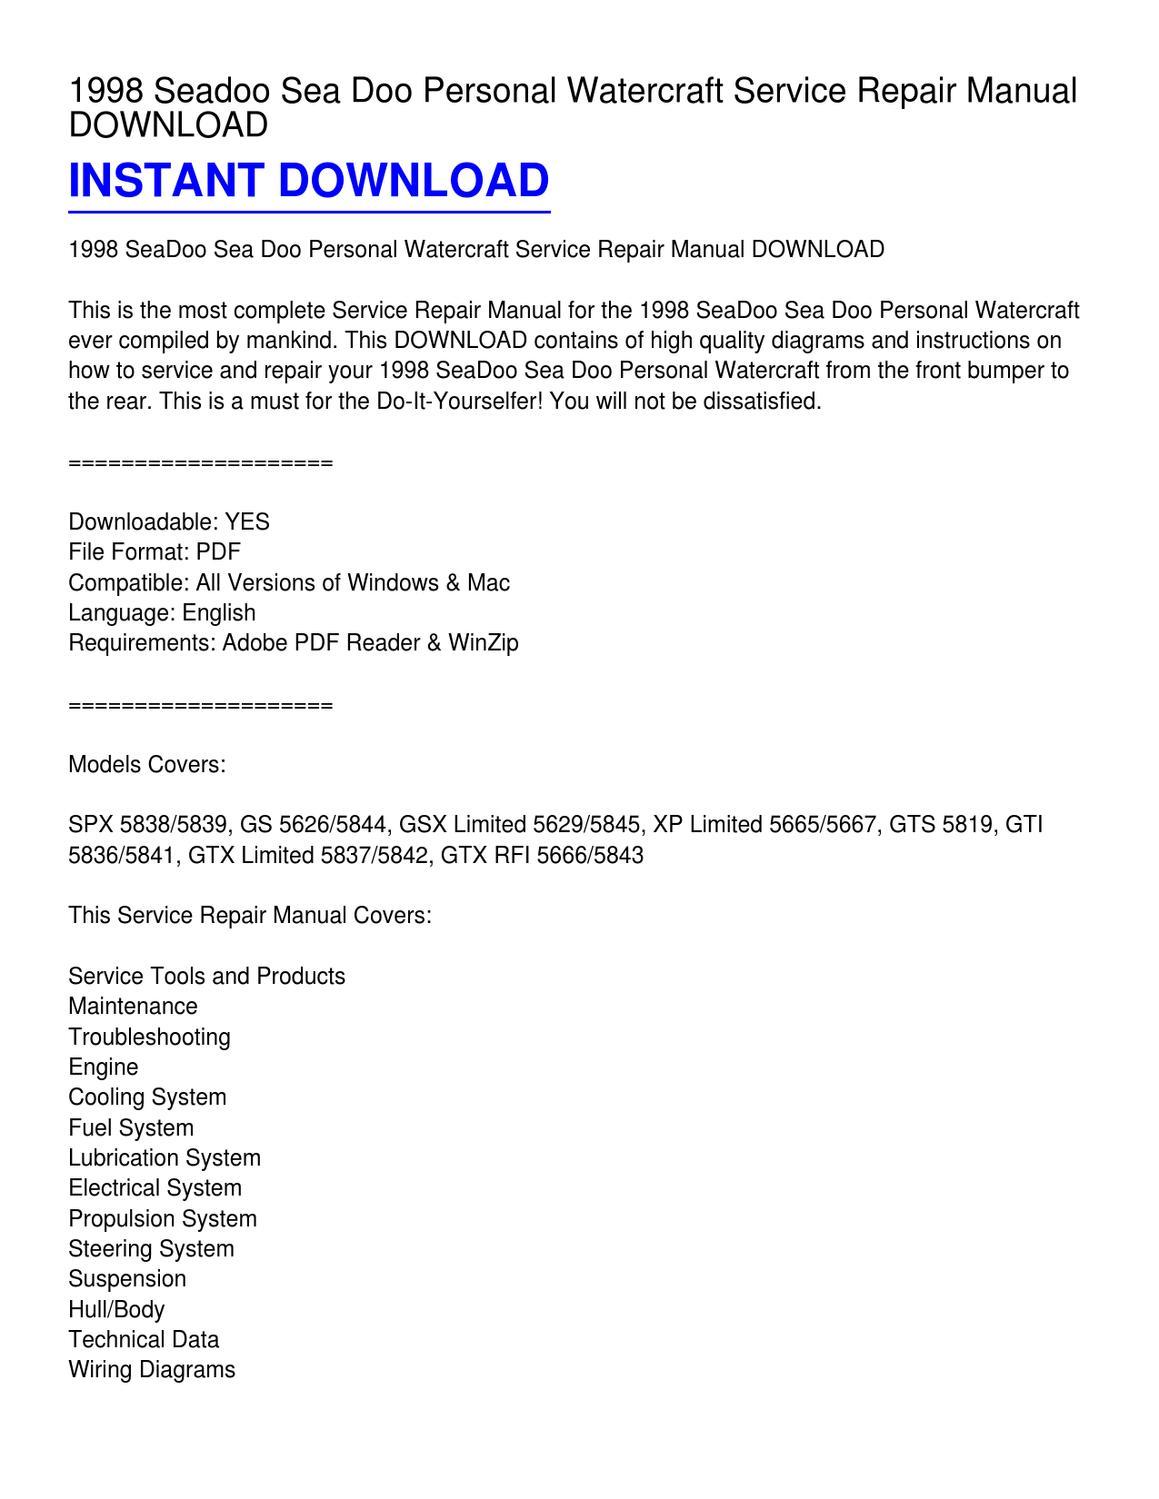 1998 seadoo sea doo personal watercraft service repair manual download by  kevin fowler - issuu